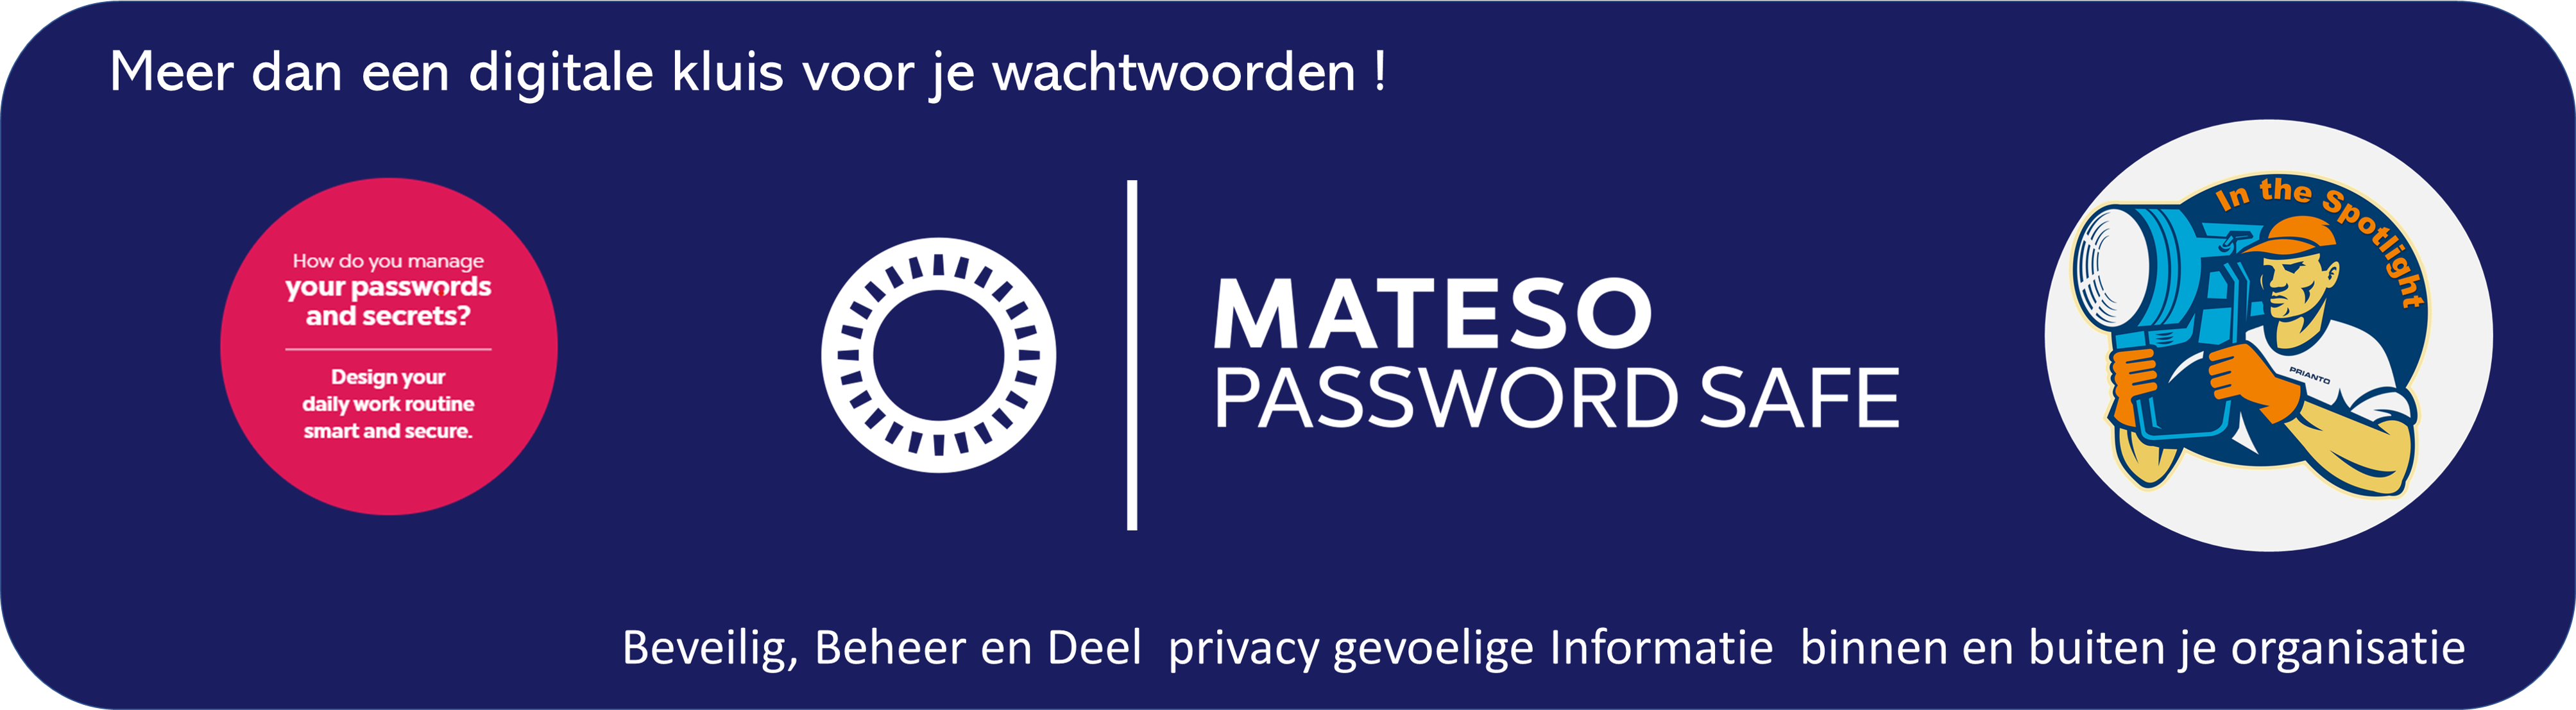 Productpagina Mateso Password Safe